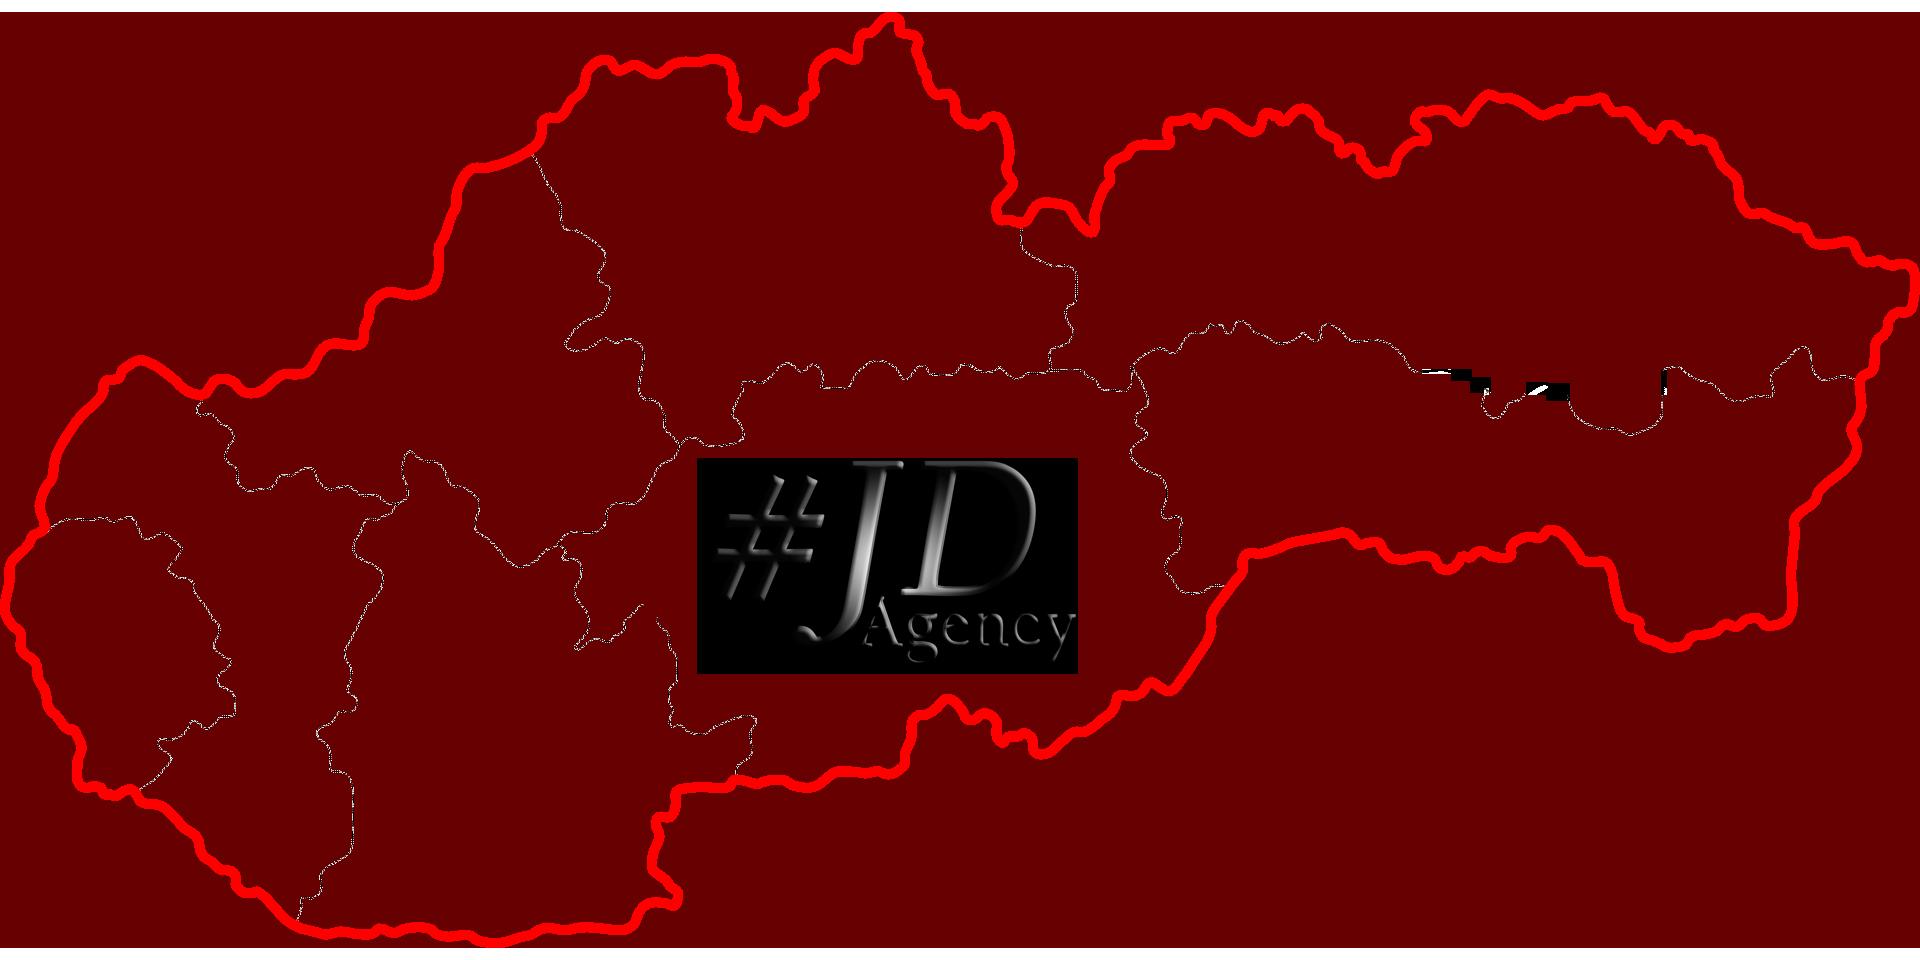 Regionálna podpora JD Agency